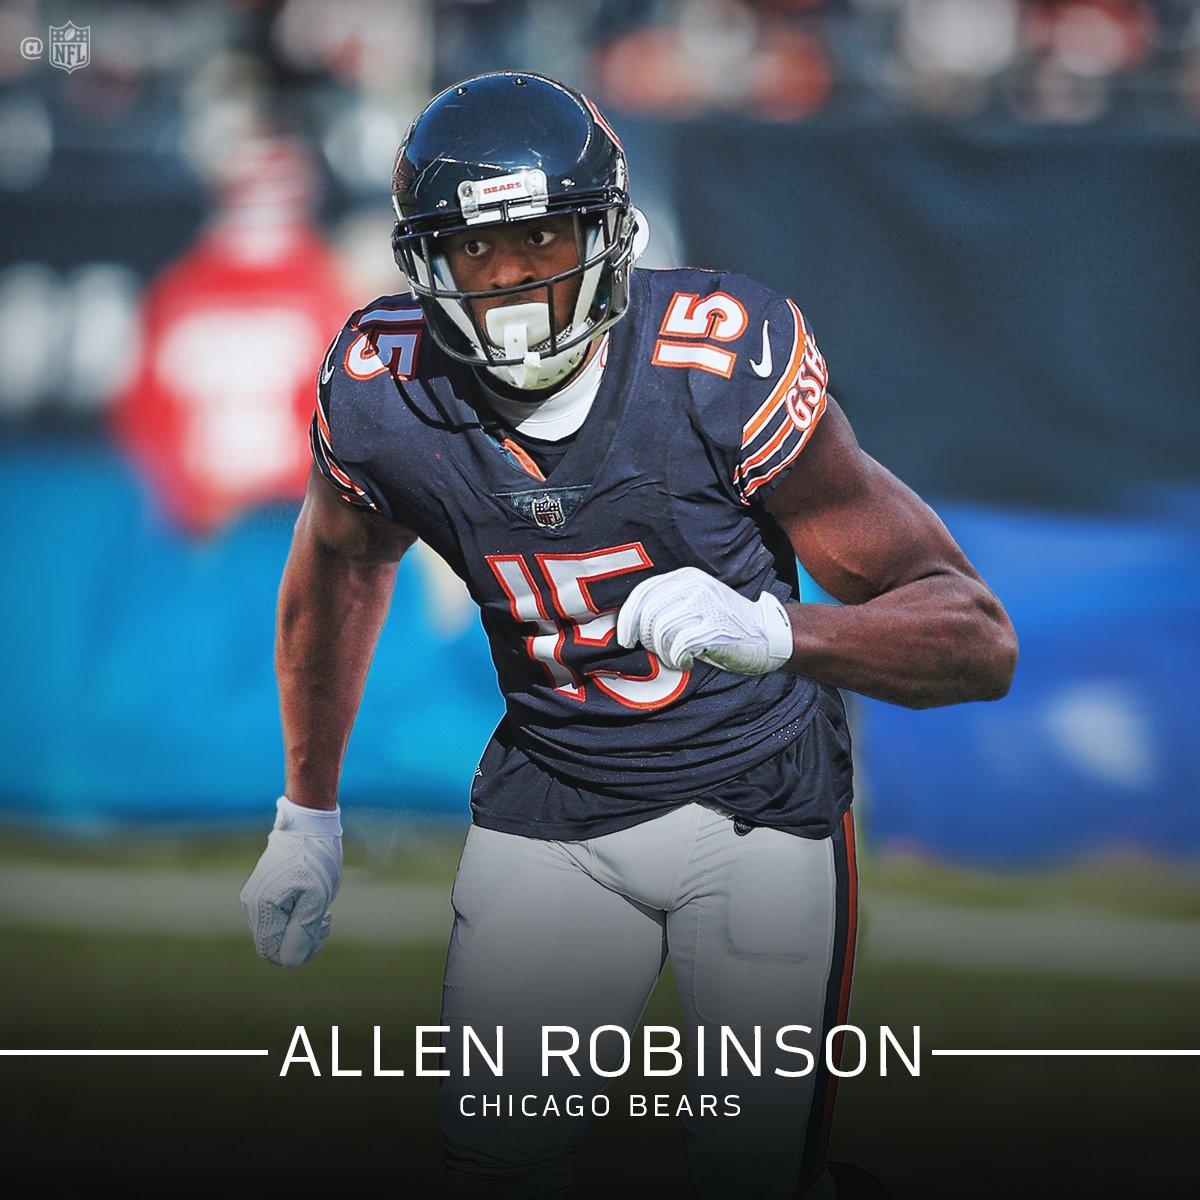 online store 16b9f d8495 NFL on Twitter: